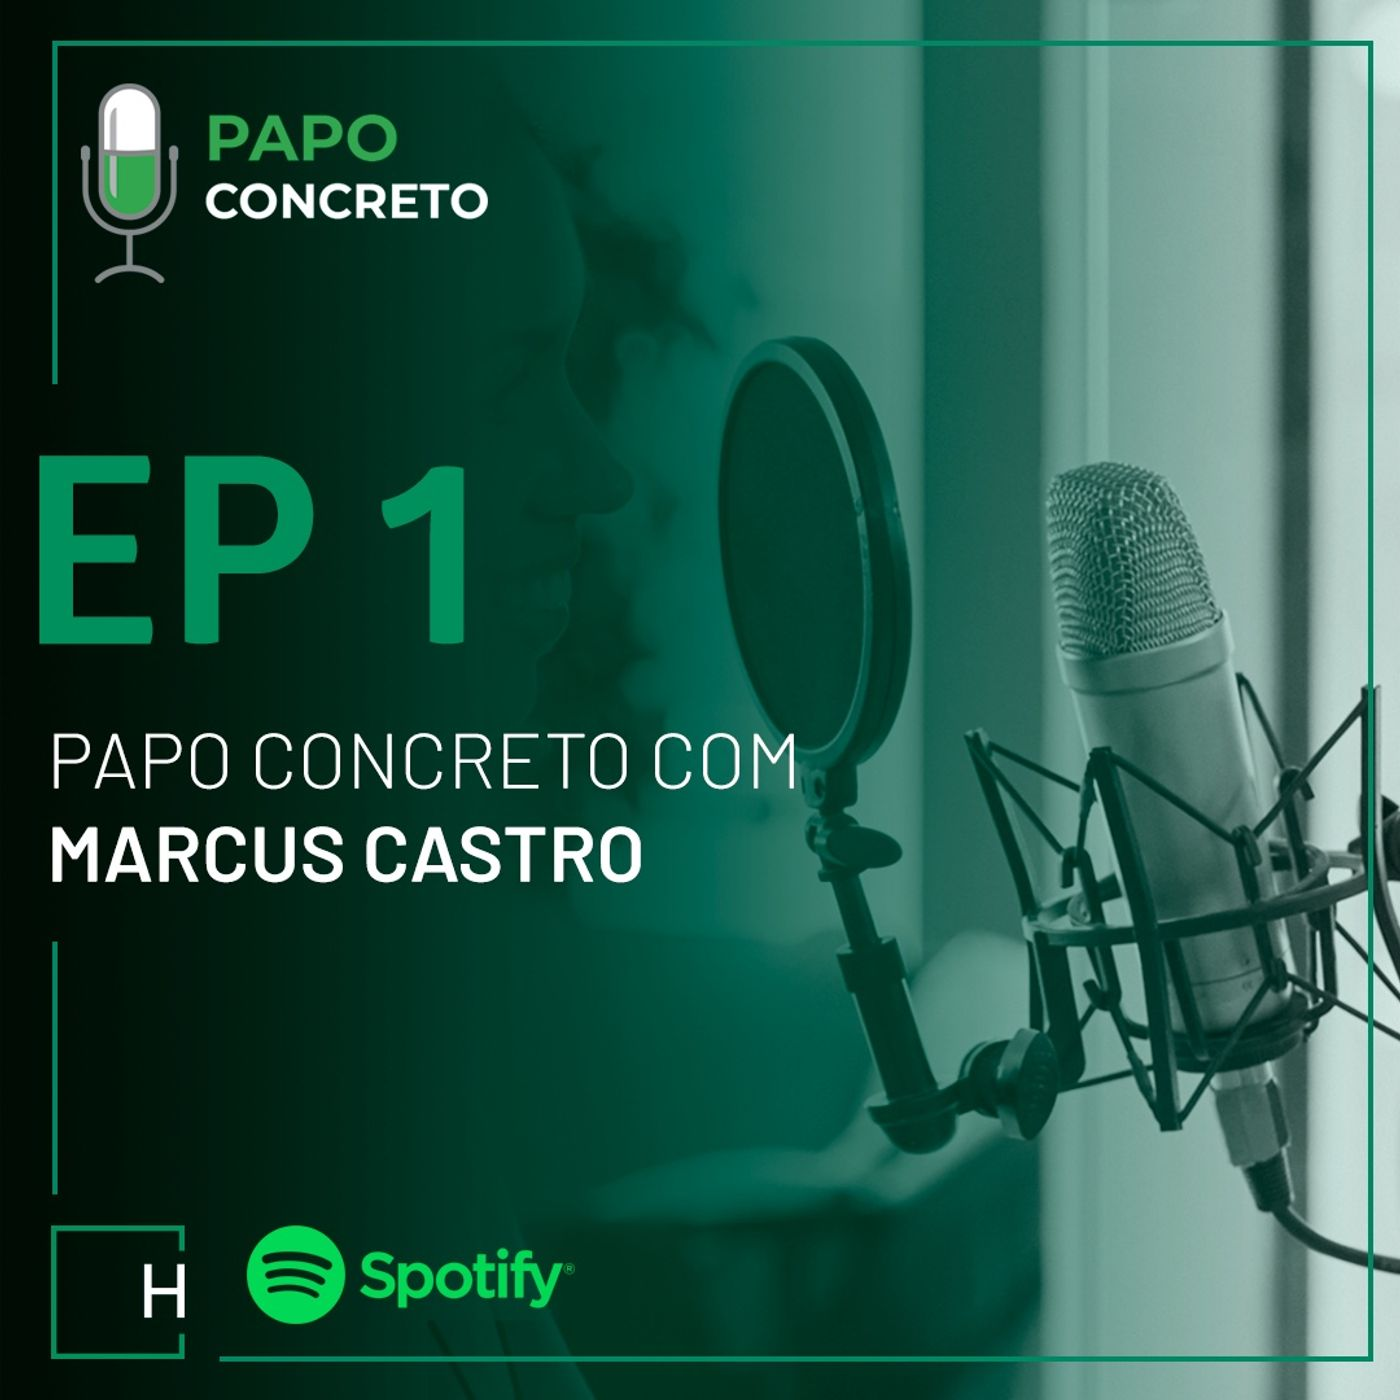 Papo Concreto apresenta Marcus Castro